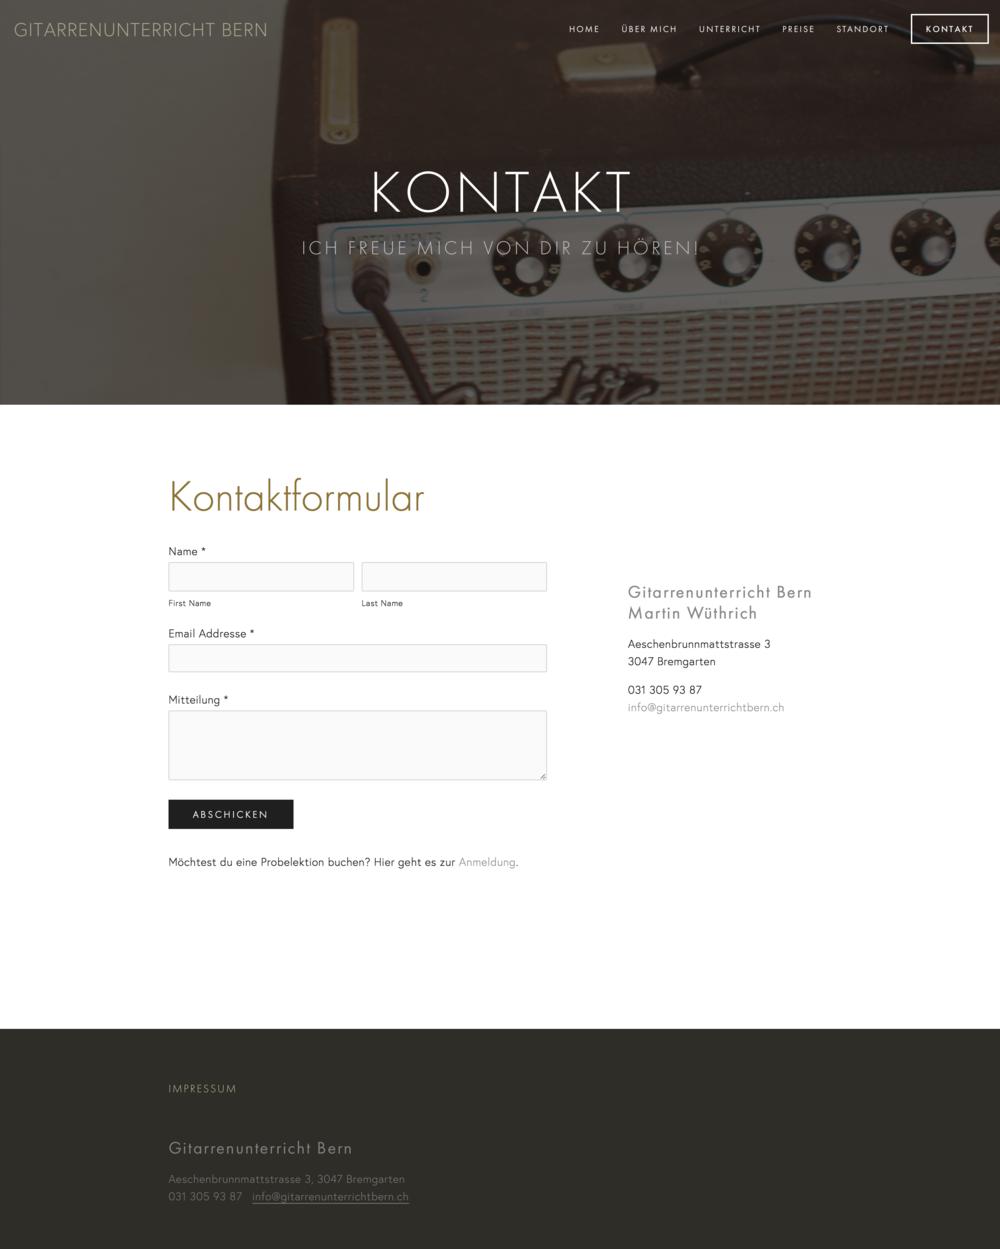 gitarrenunterricht_kontakt.png